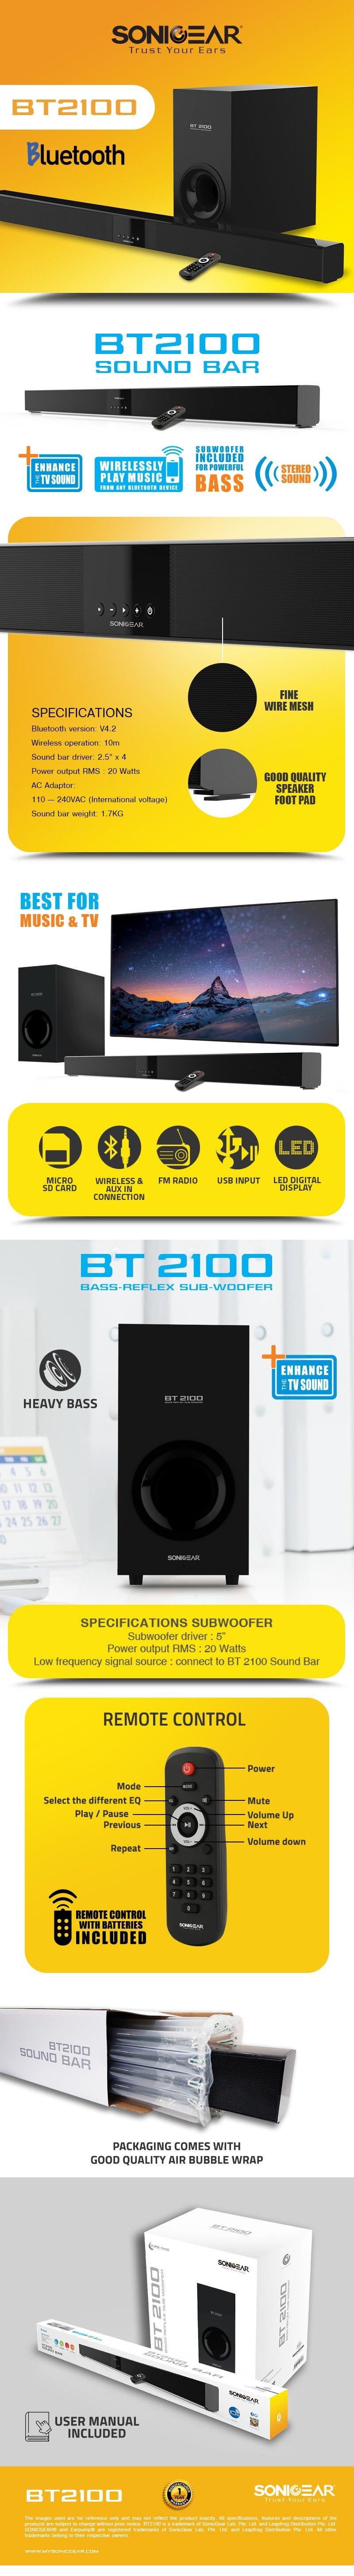 BT2100